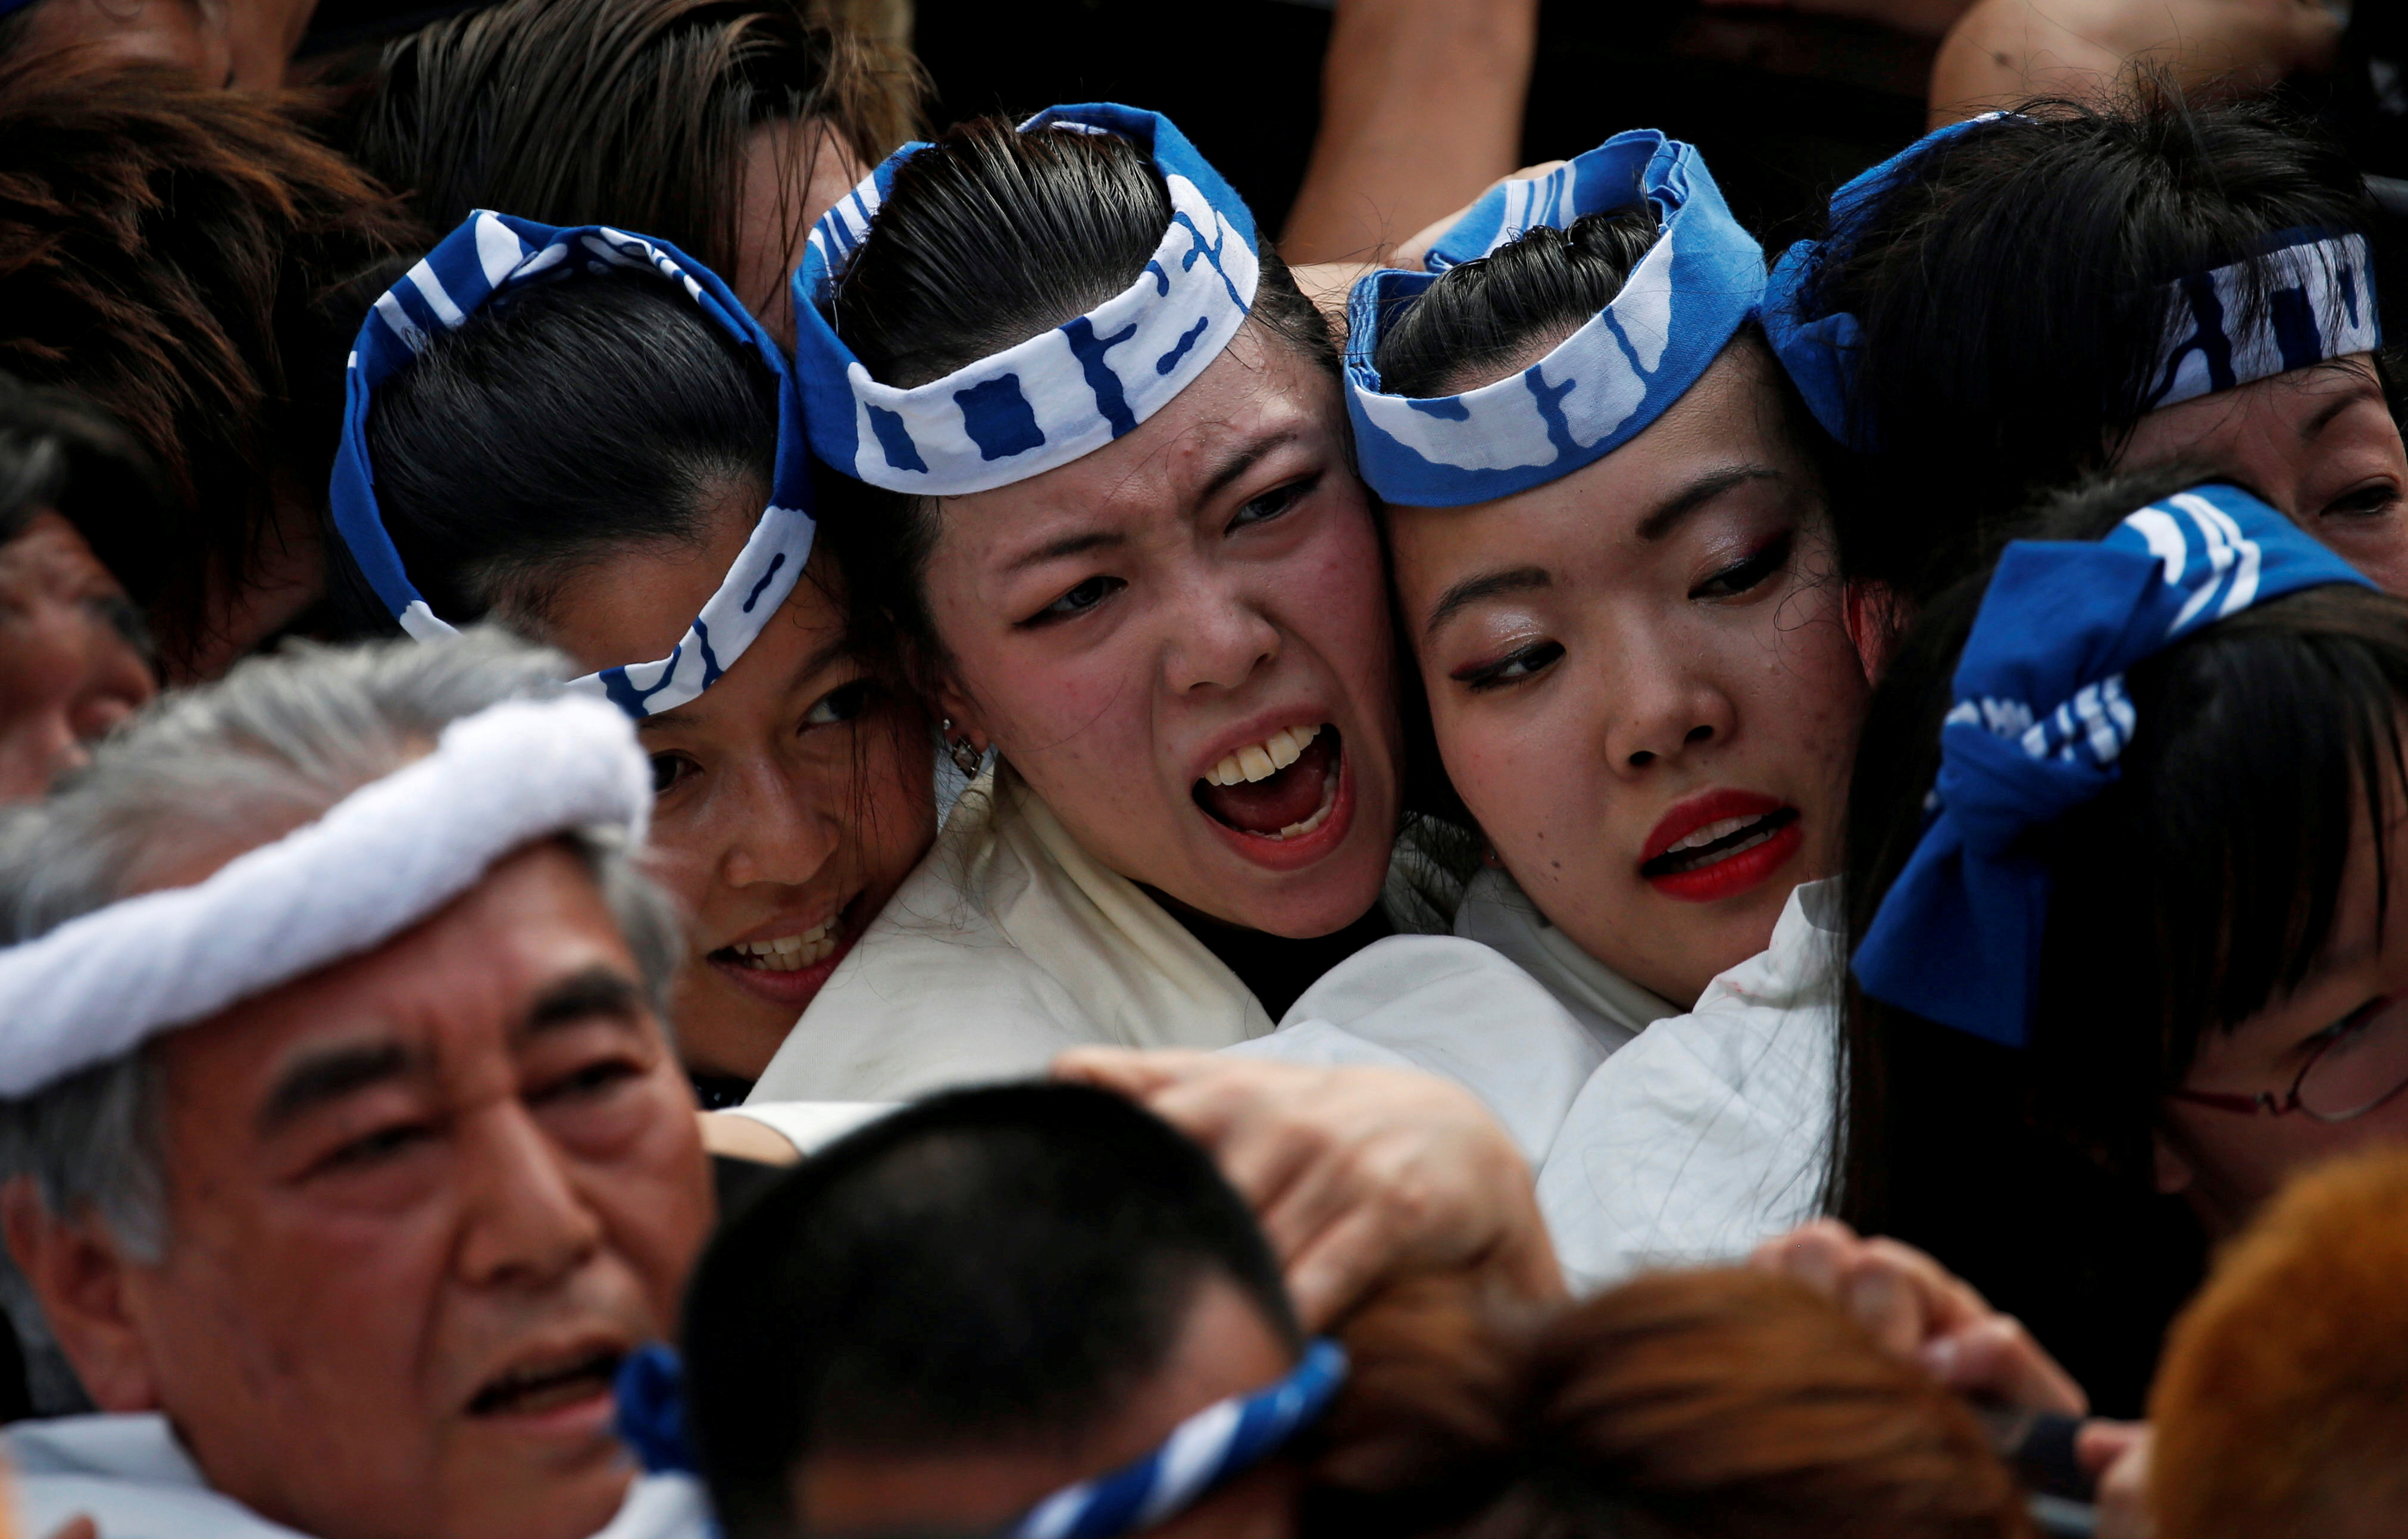 Shrine parishioners carry a portable shrine into the Kanda Myojin Shrine during the Kanda festival, one of the three major Shinto festivals in Tokyo, Japan, May 14, 2017.   REUTERS/Toru Hanai/File Photo